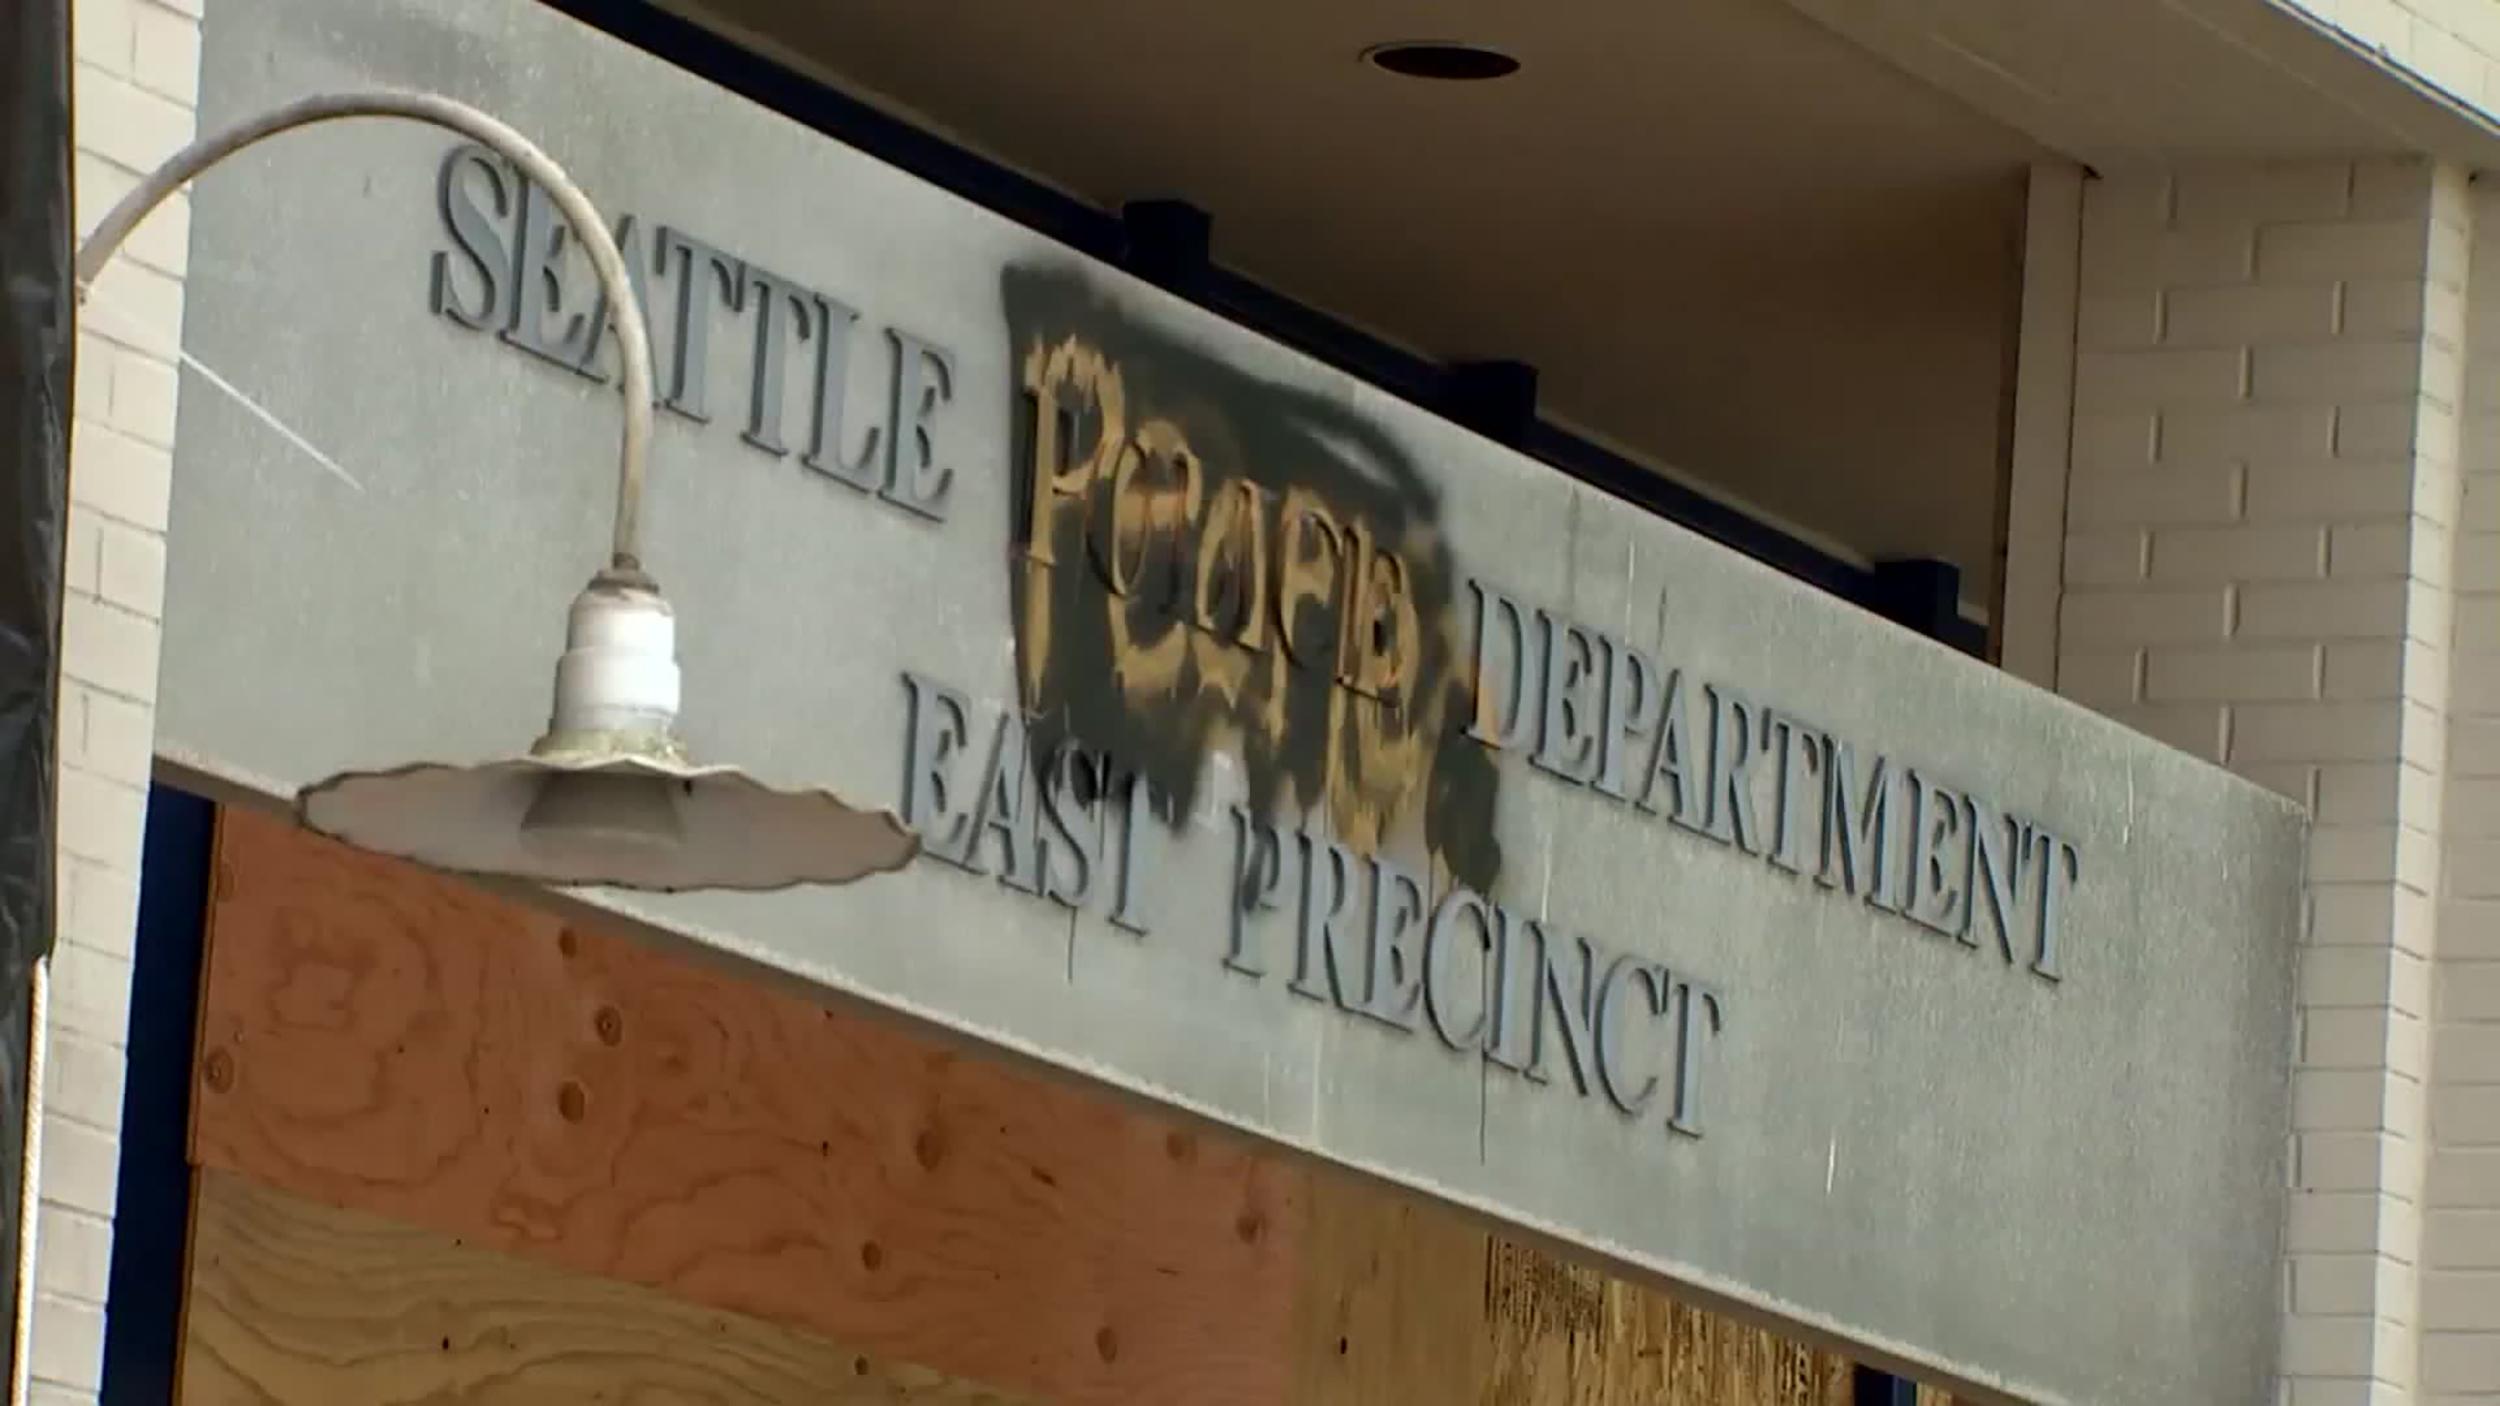 Seattle Police Department East Precinct